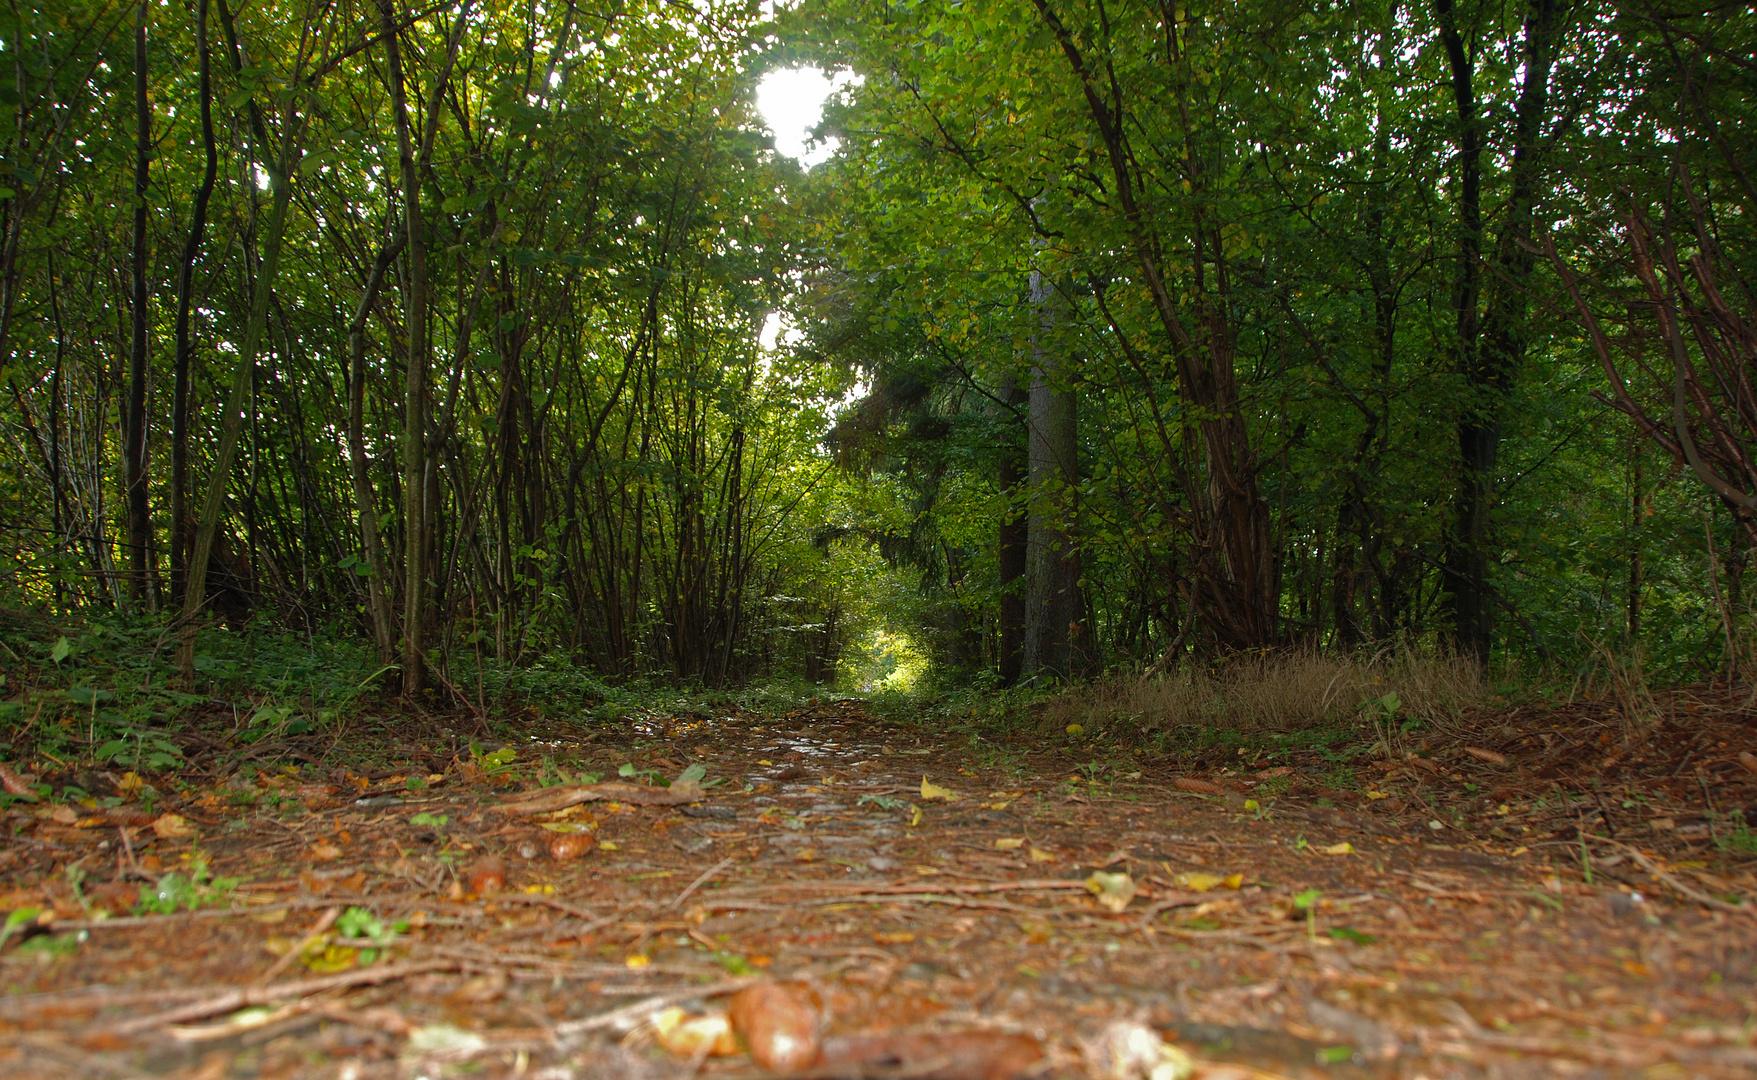 der verlassene Weg